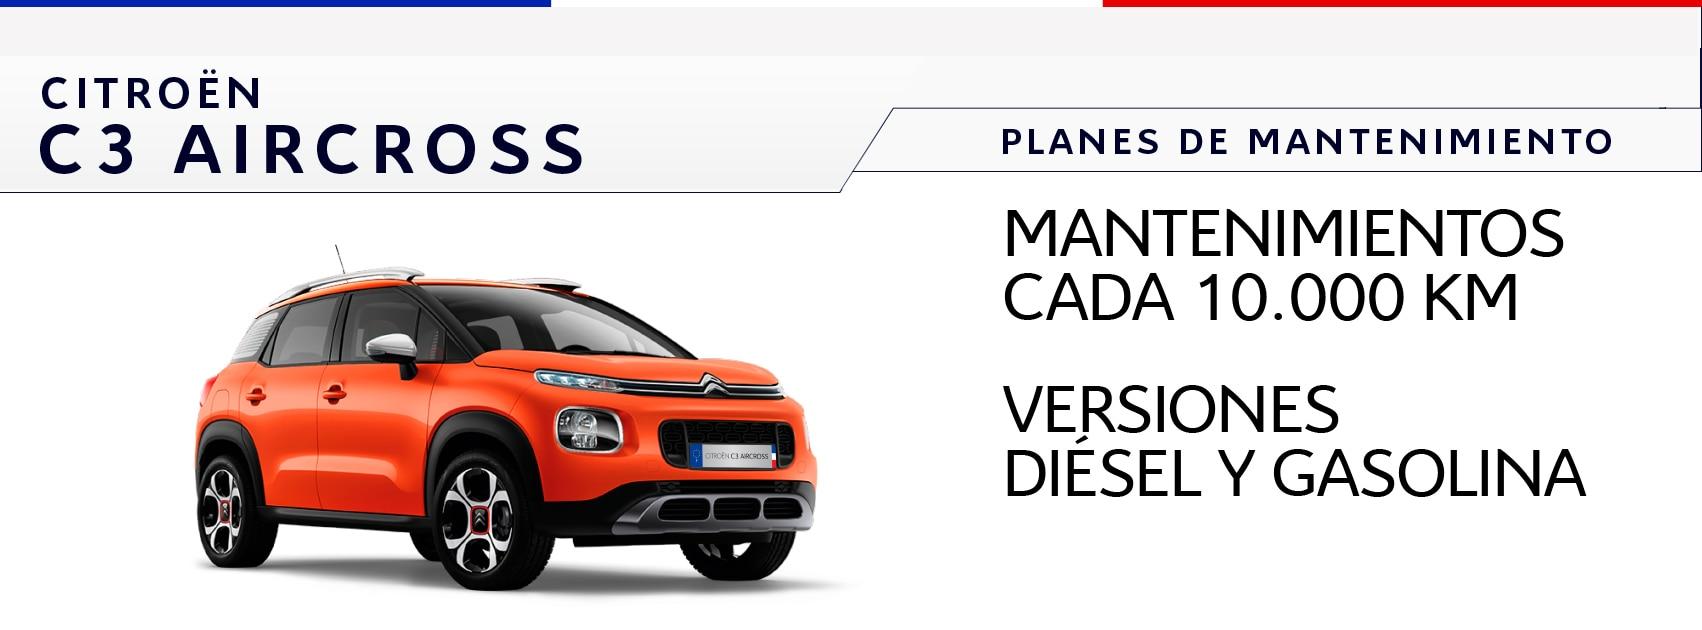 citroen-planes-mantenimiento-c3aircross-2020-banner